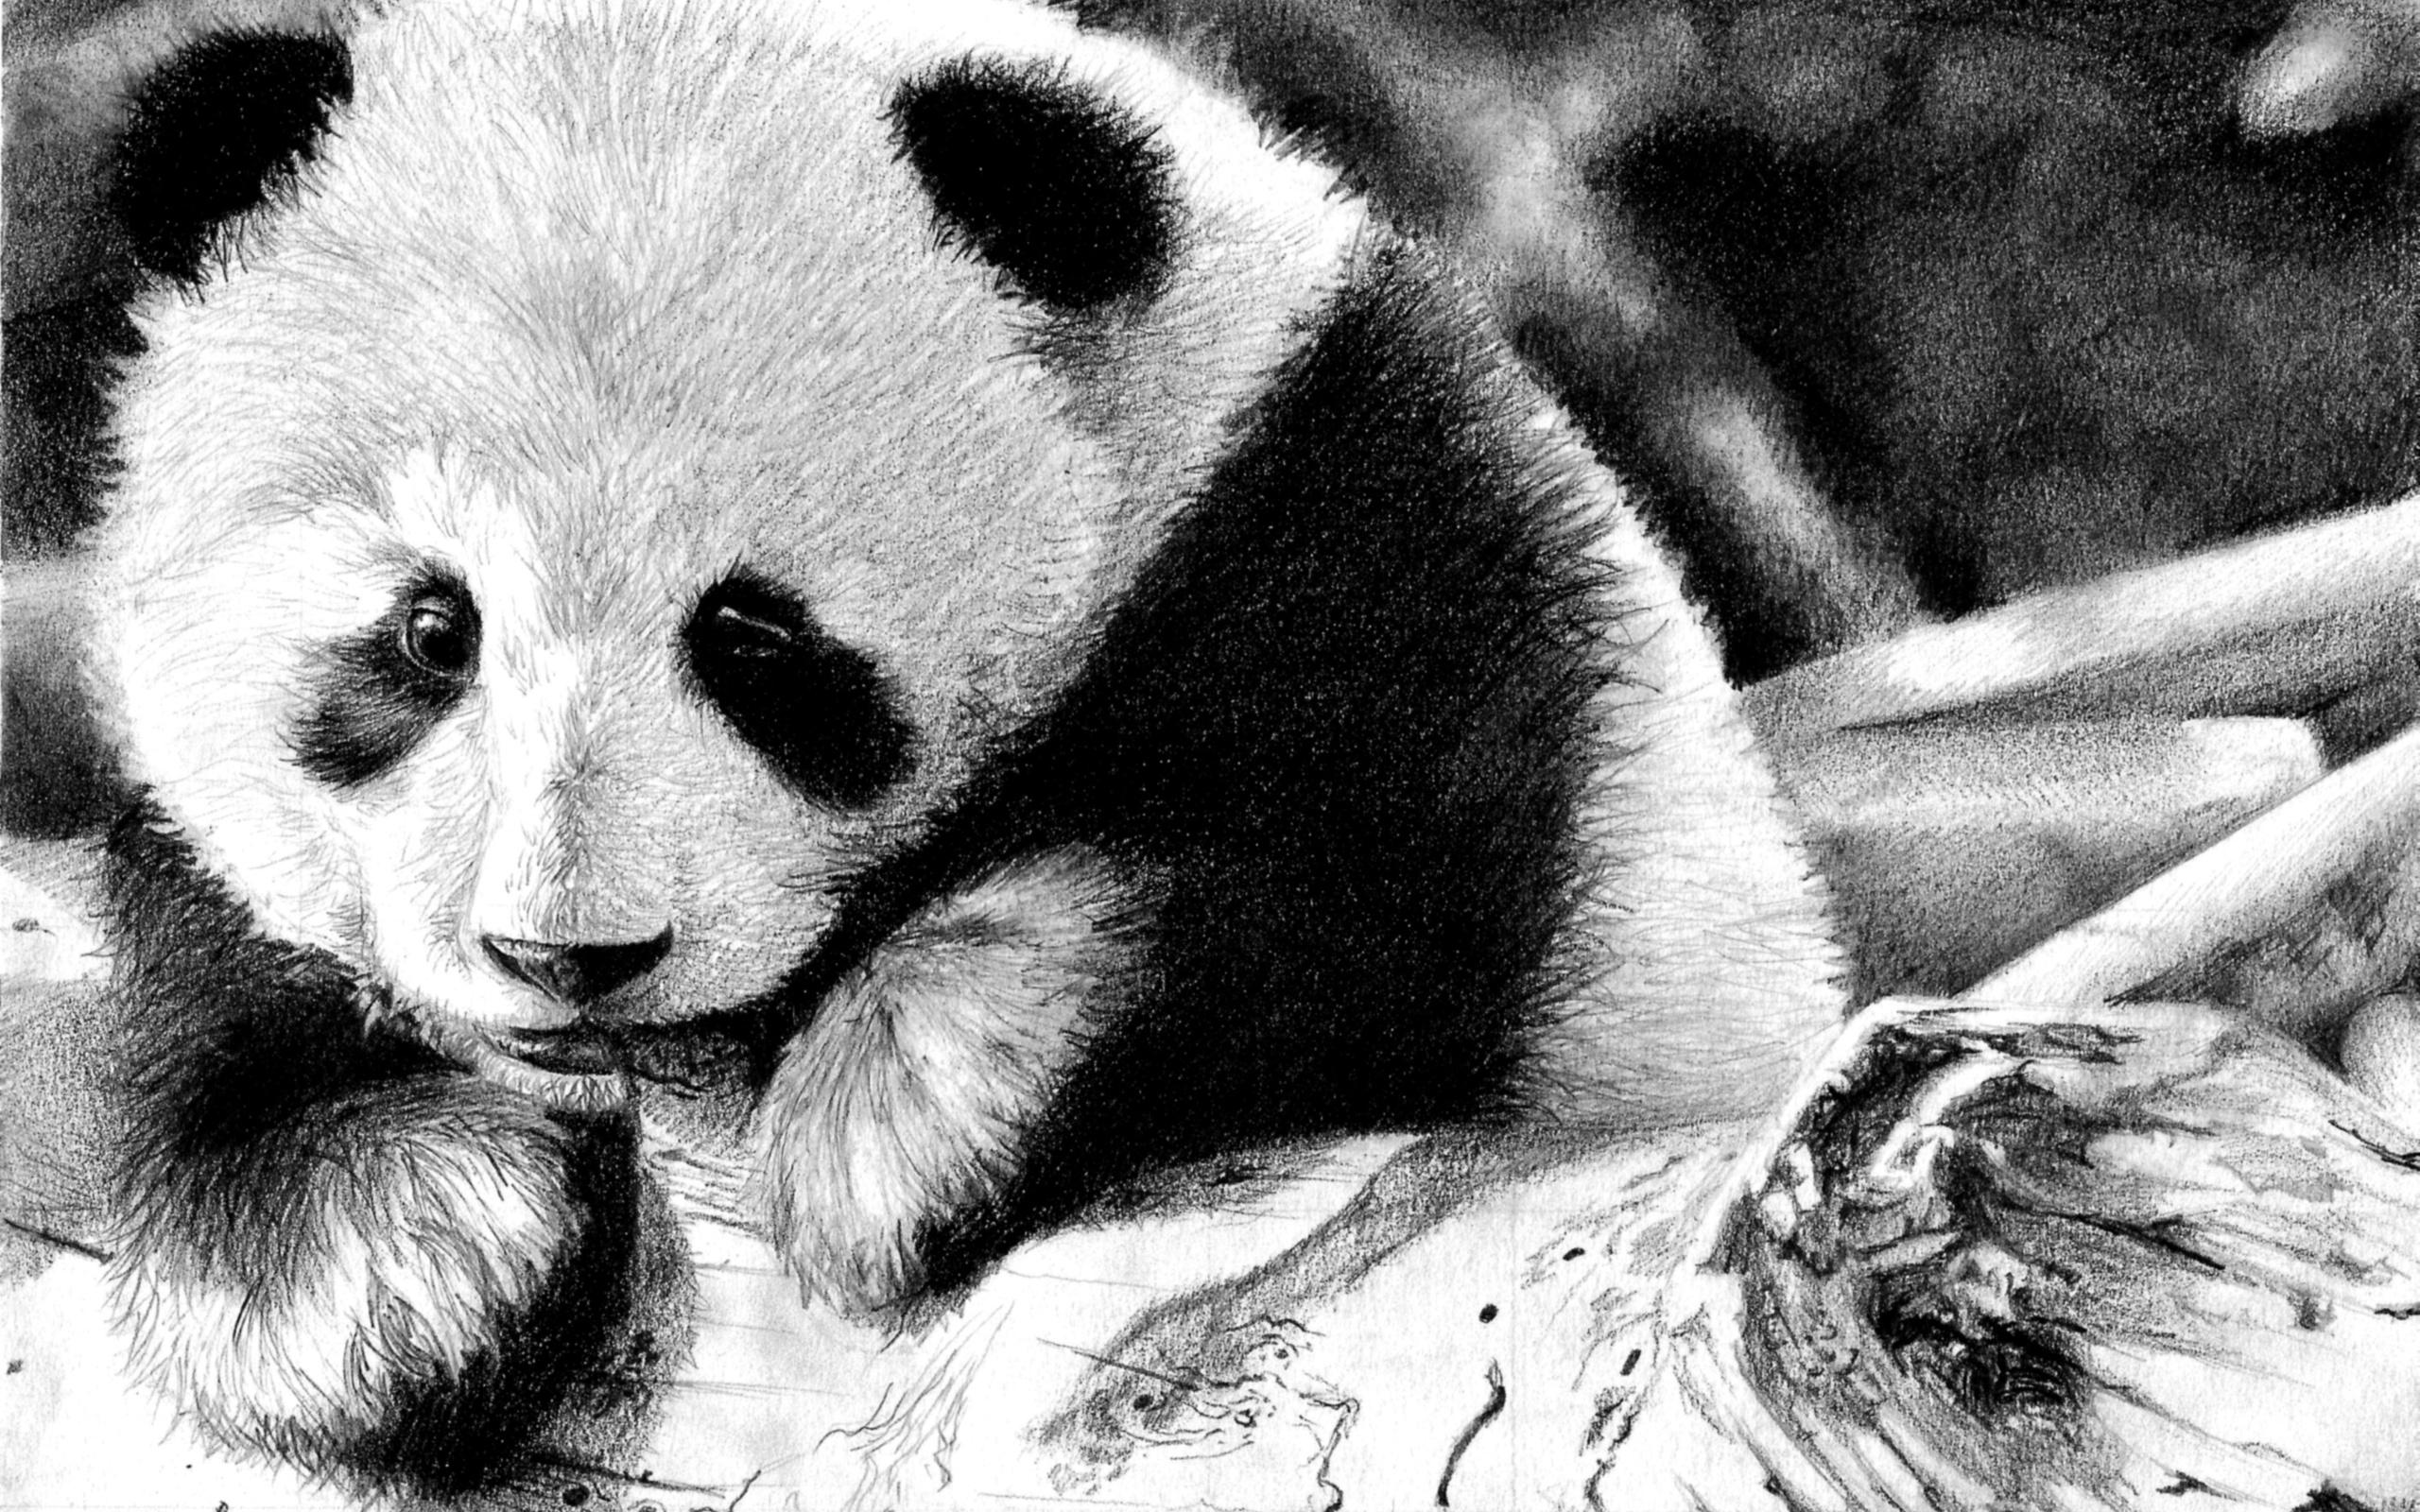 192 Panda HD Wallpapers | Backgrounds - Wallpaper Abyss ...